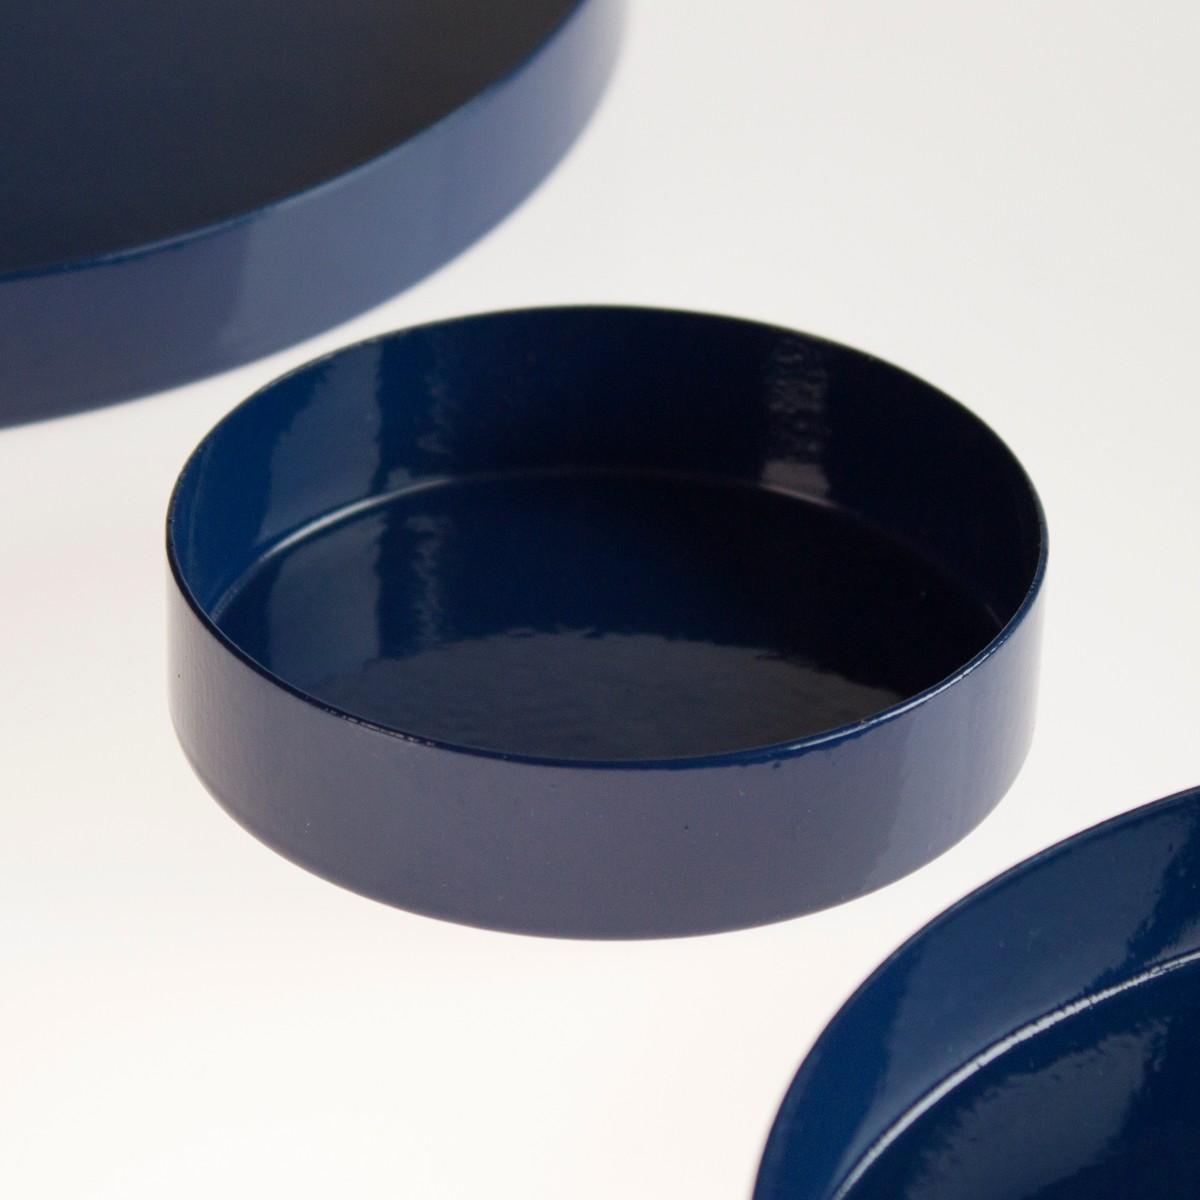 Photo of Small Royal Blue Tray